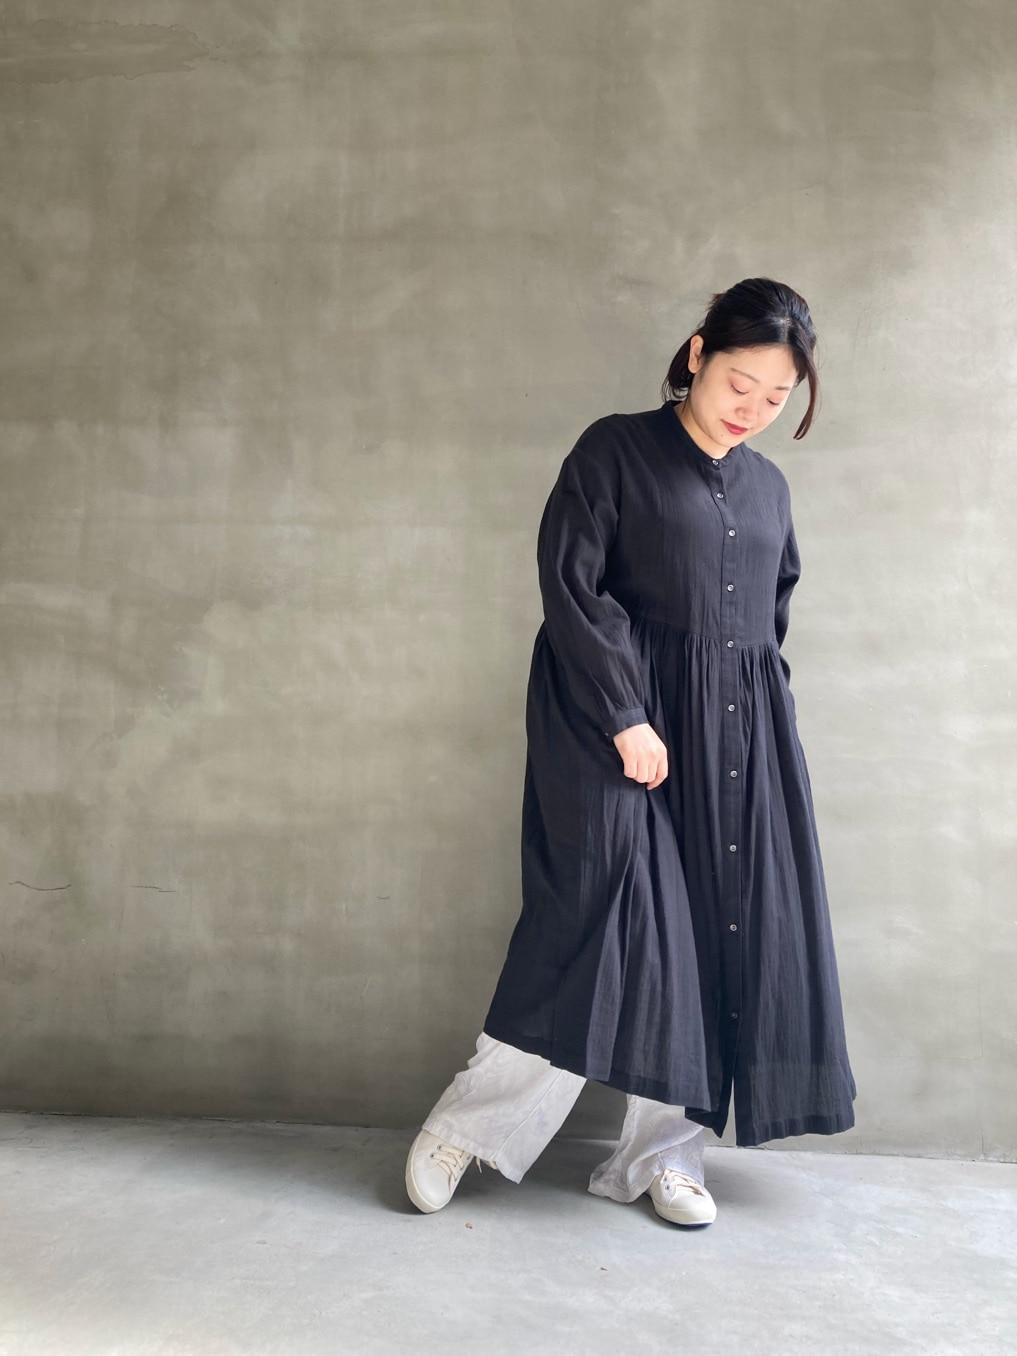 108 yuni / bulle de savon 福岡薬院路面 身長:150cm 2021.02.14